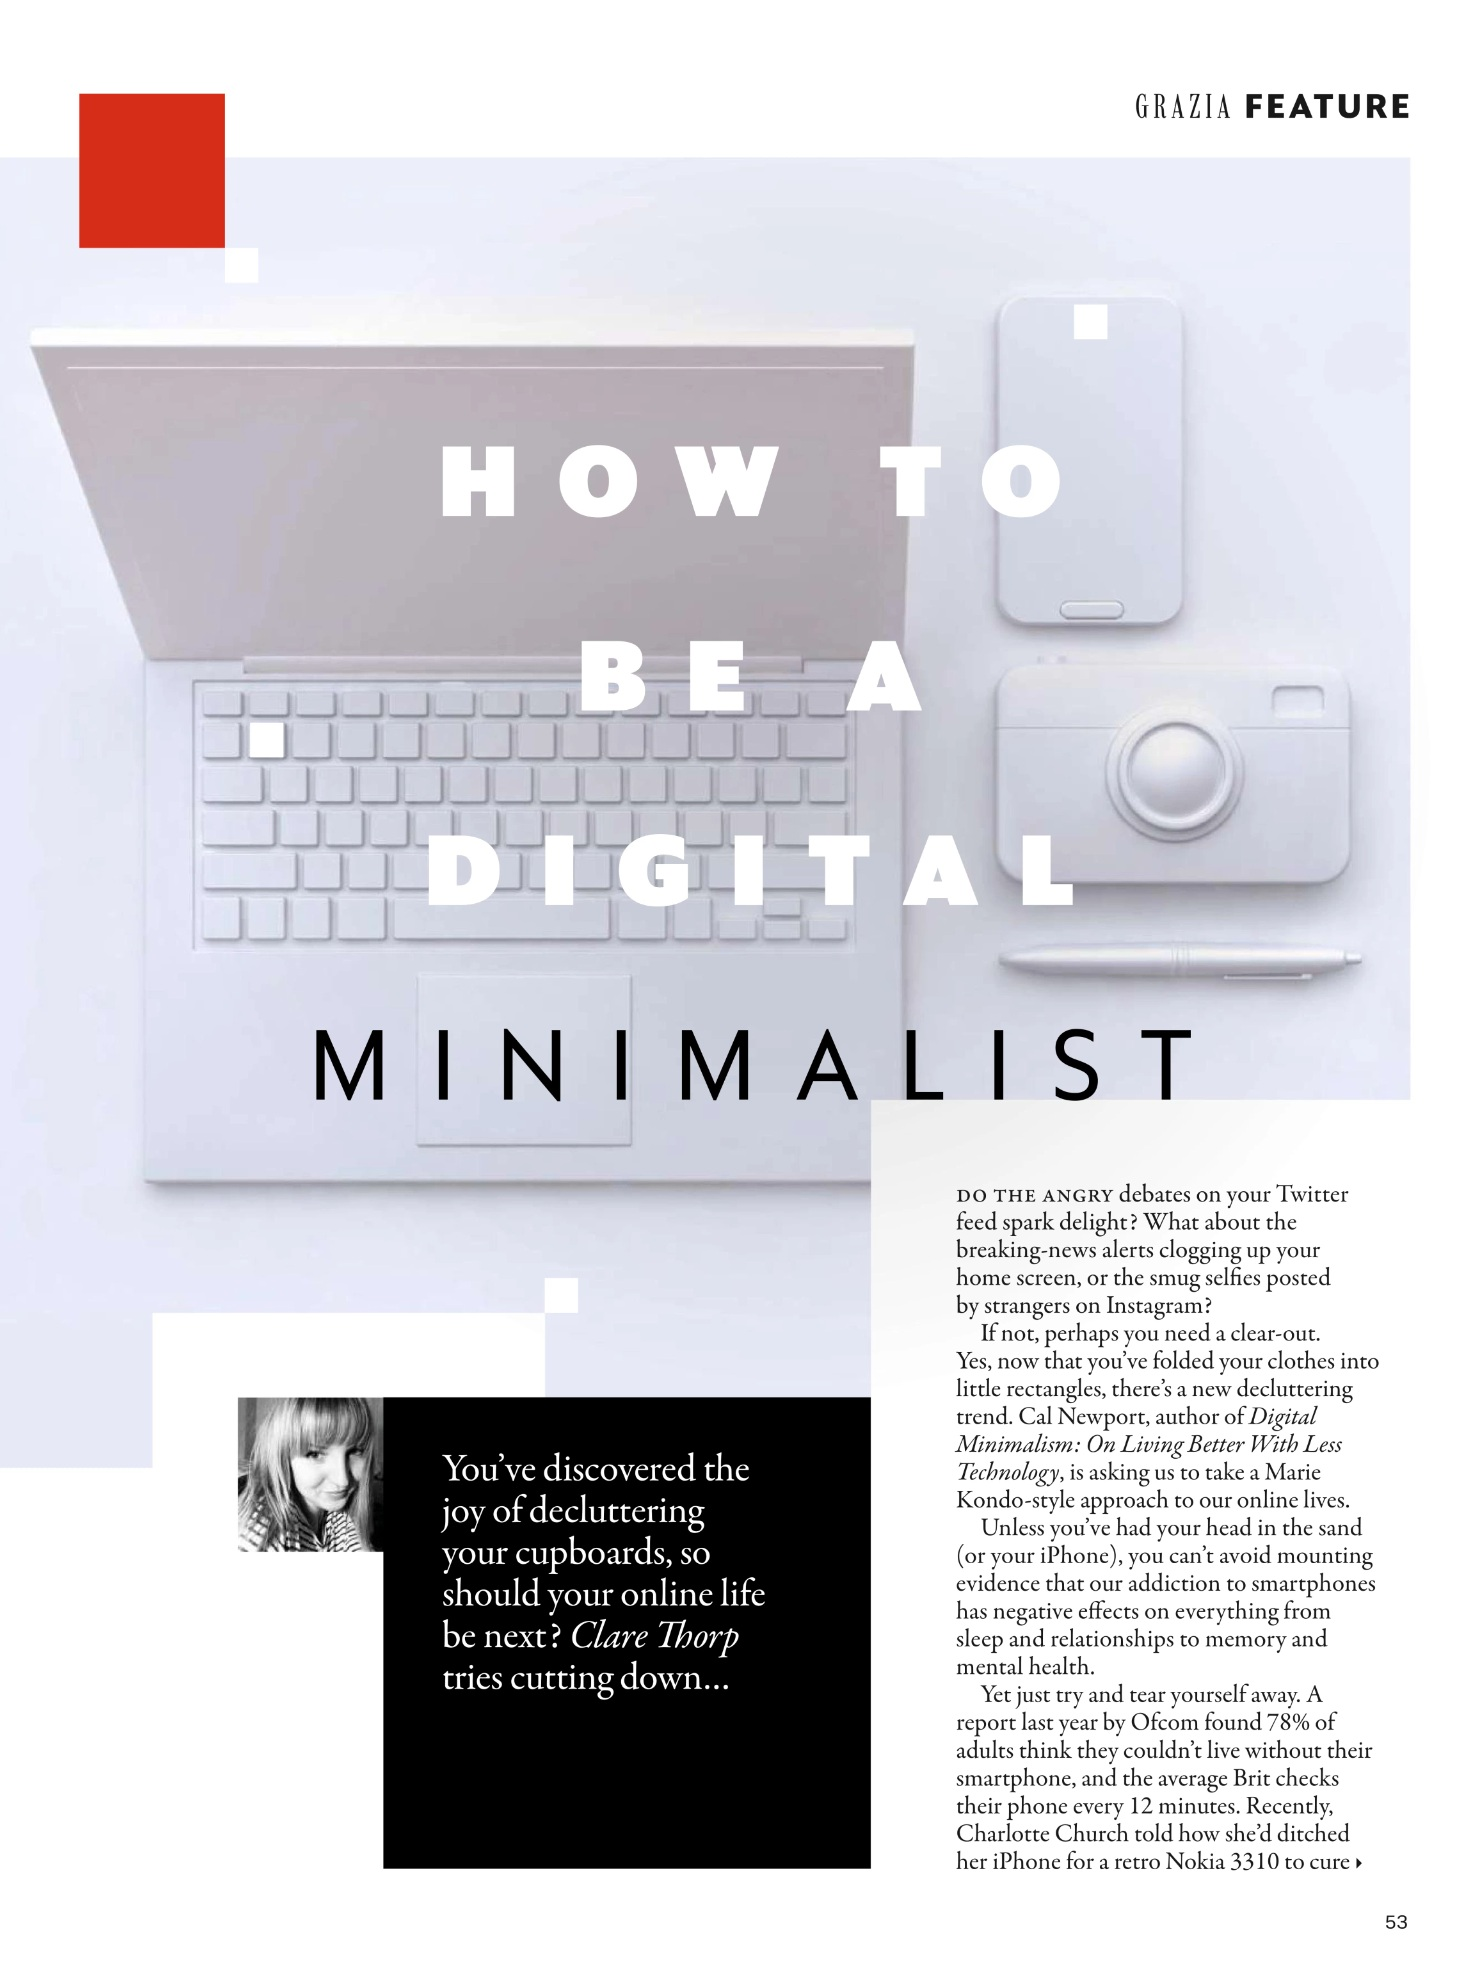 digital minimalism grazia kondo